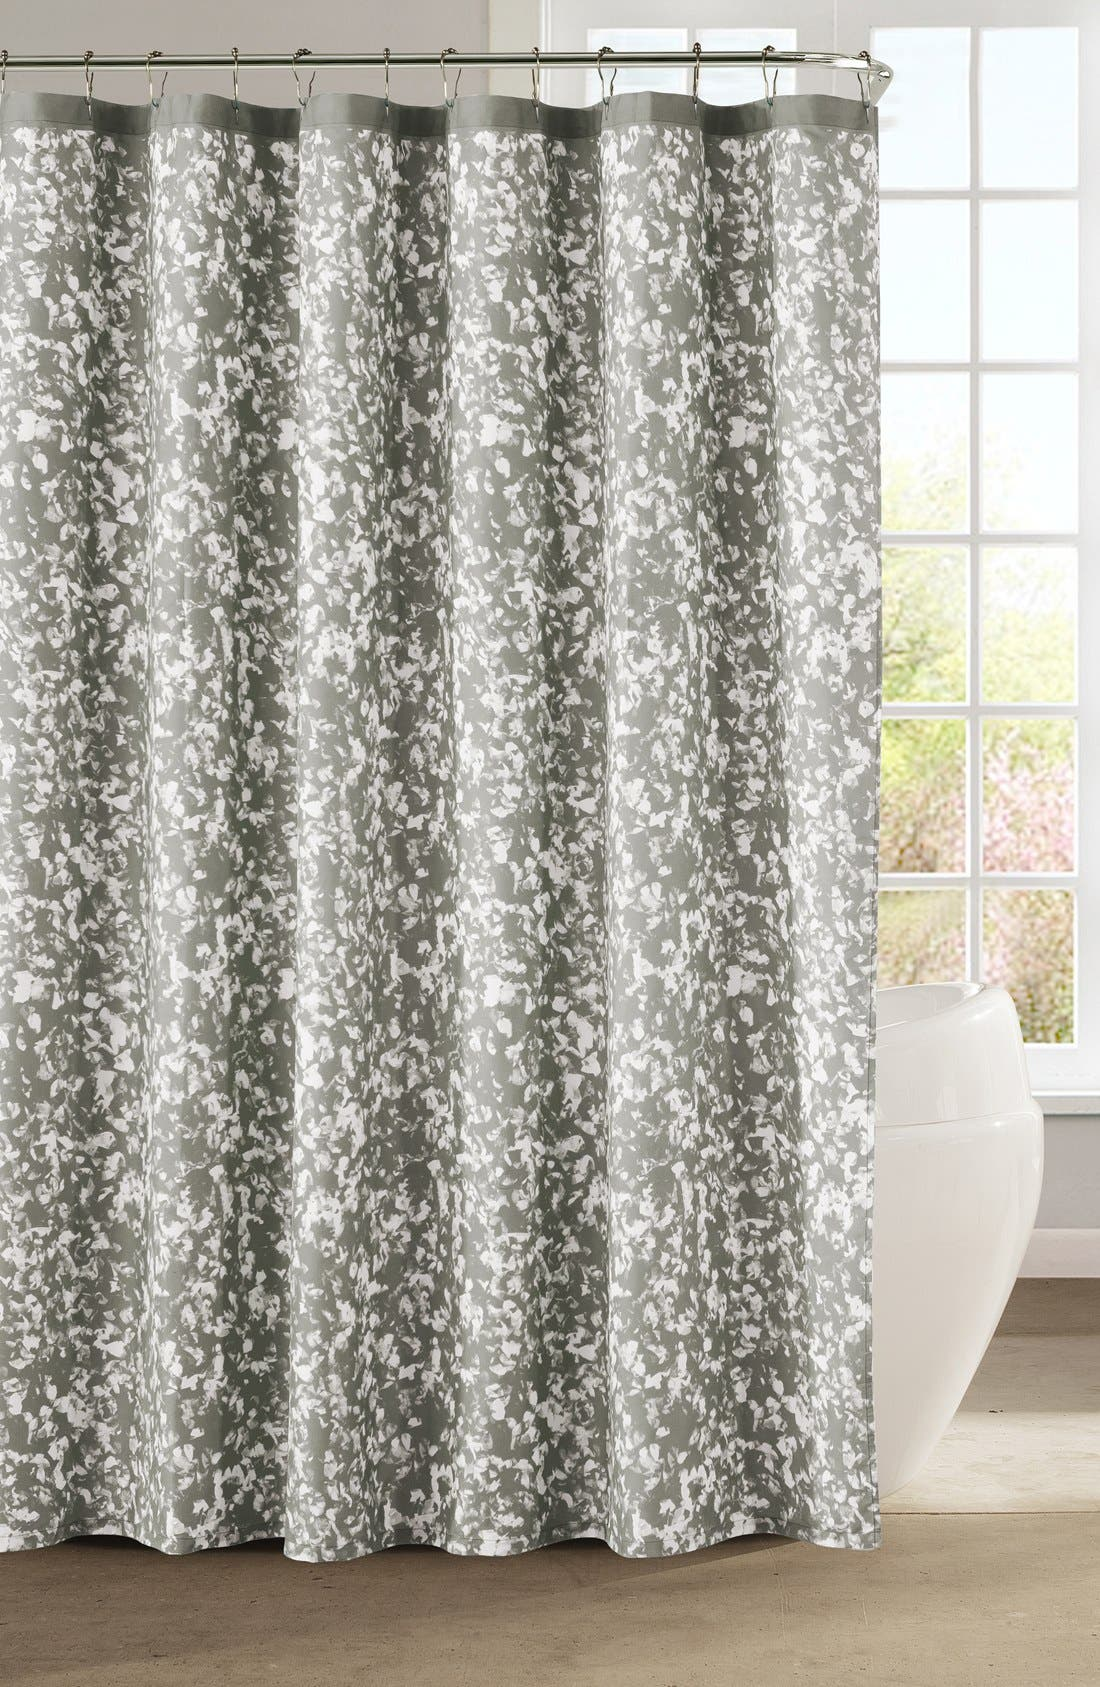 Natural shower curtain - Natural Shower Curtain 76